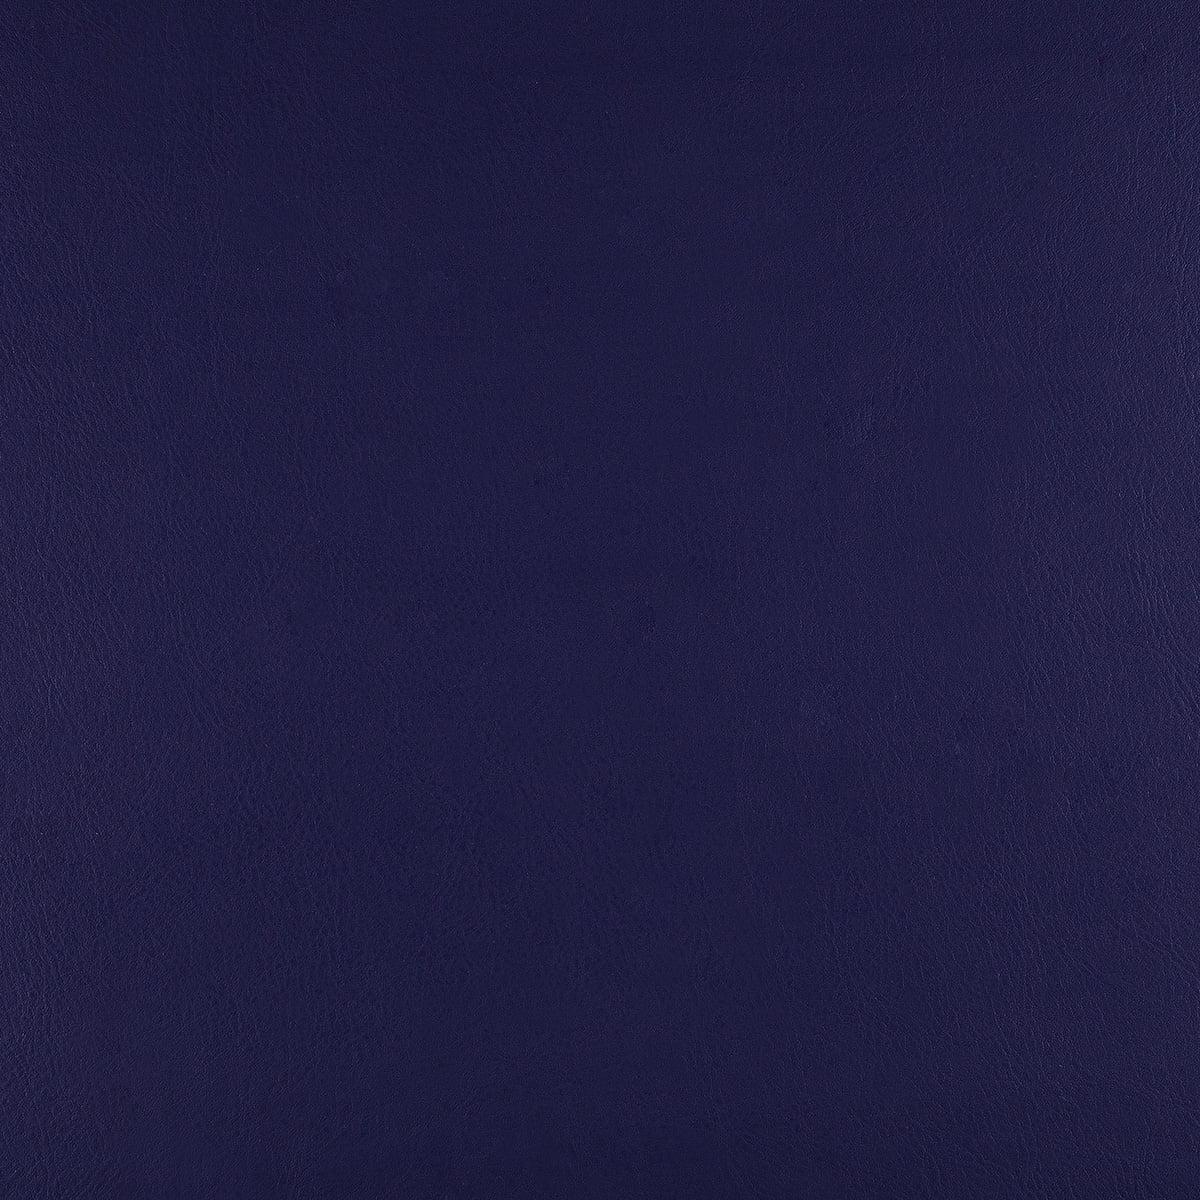 96623f9ffb43 Sapphire Blue - Chieftain Fabrics